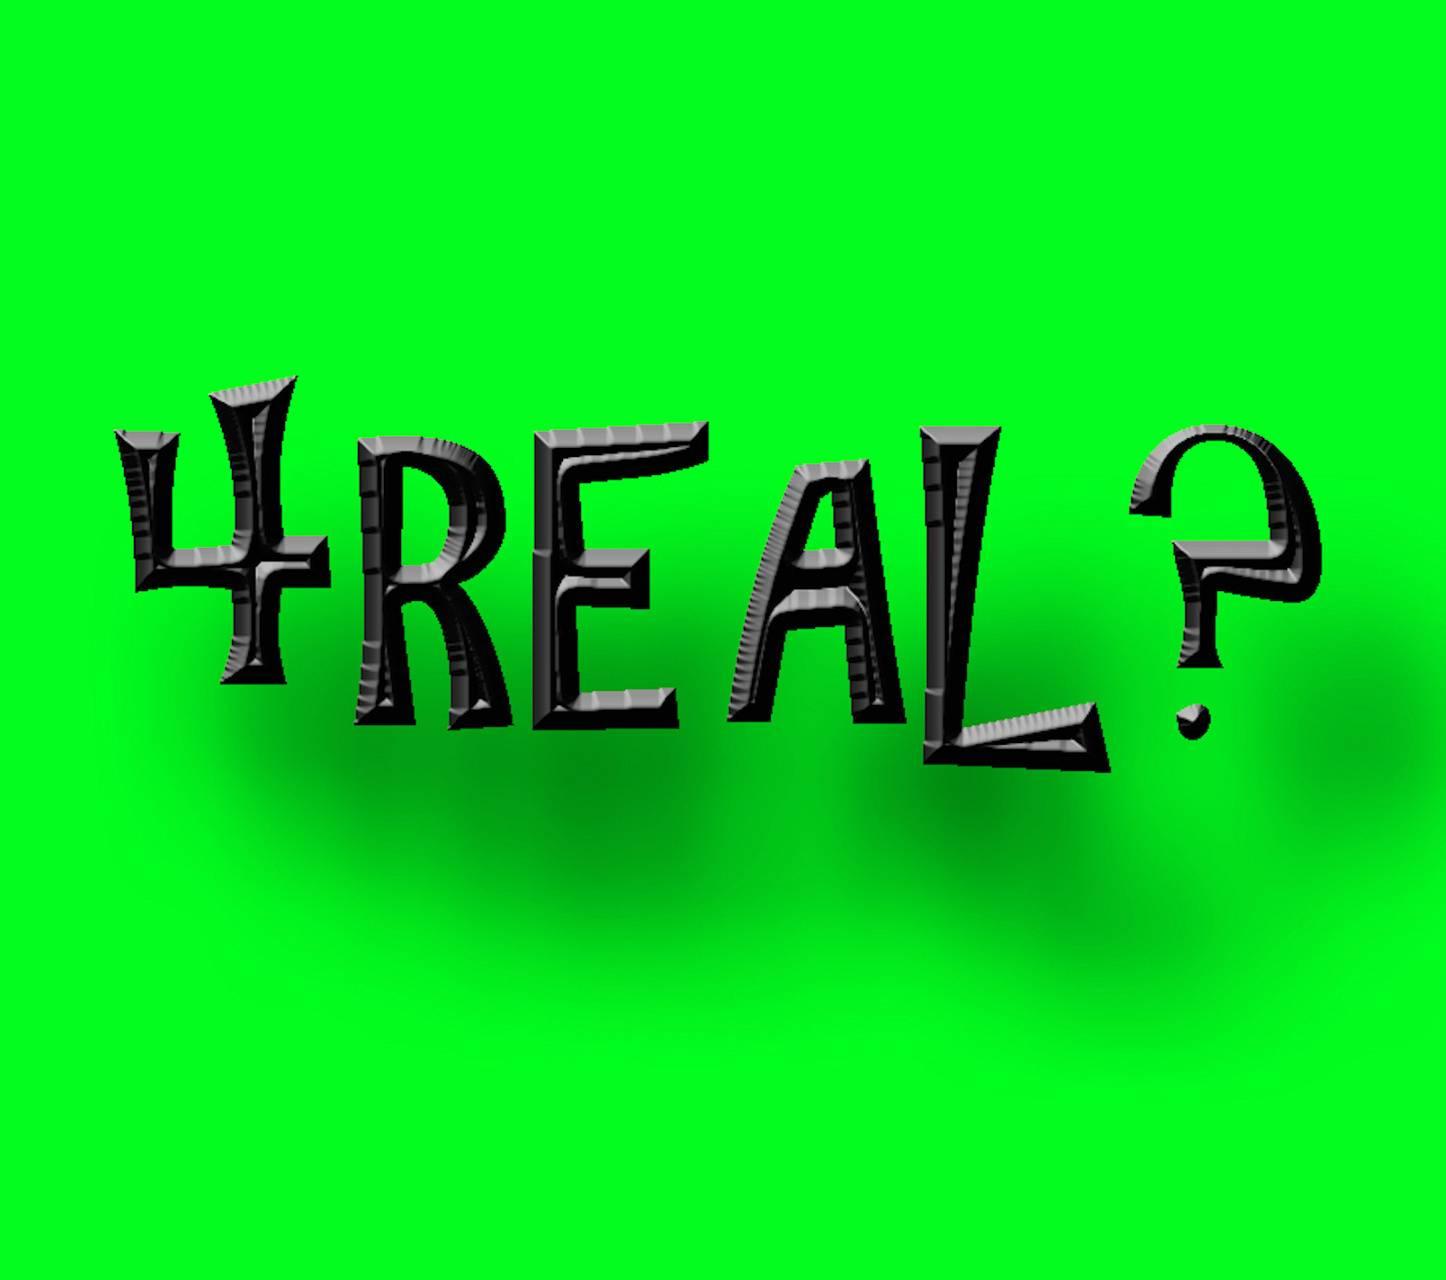 4 real